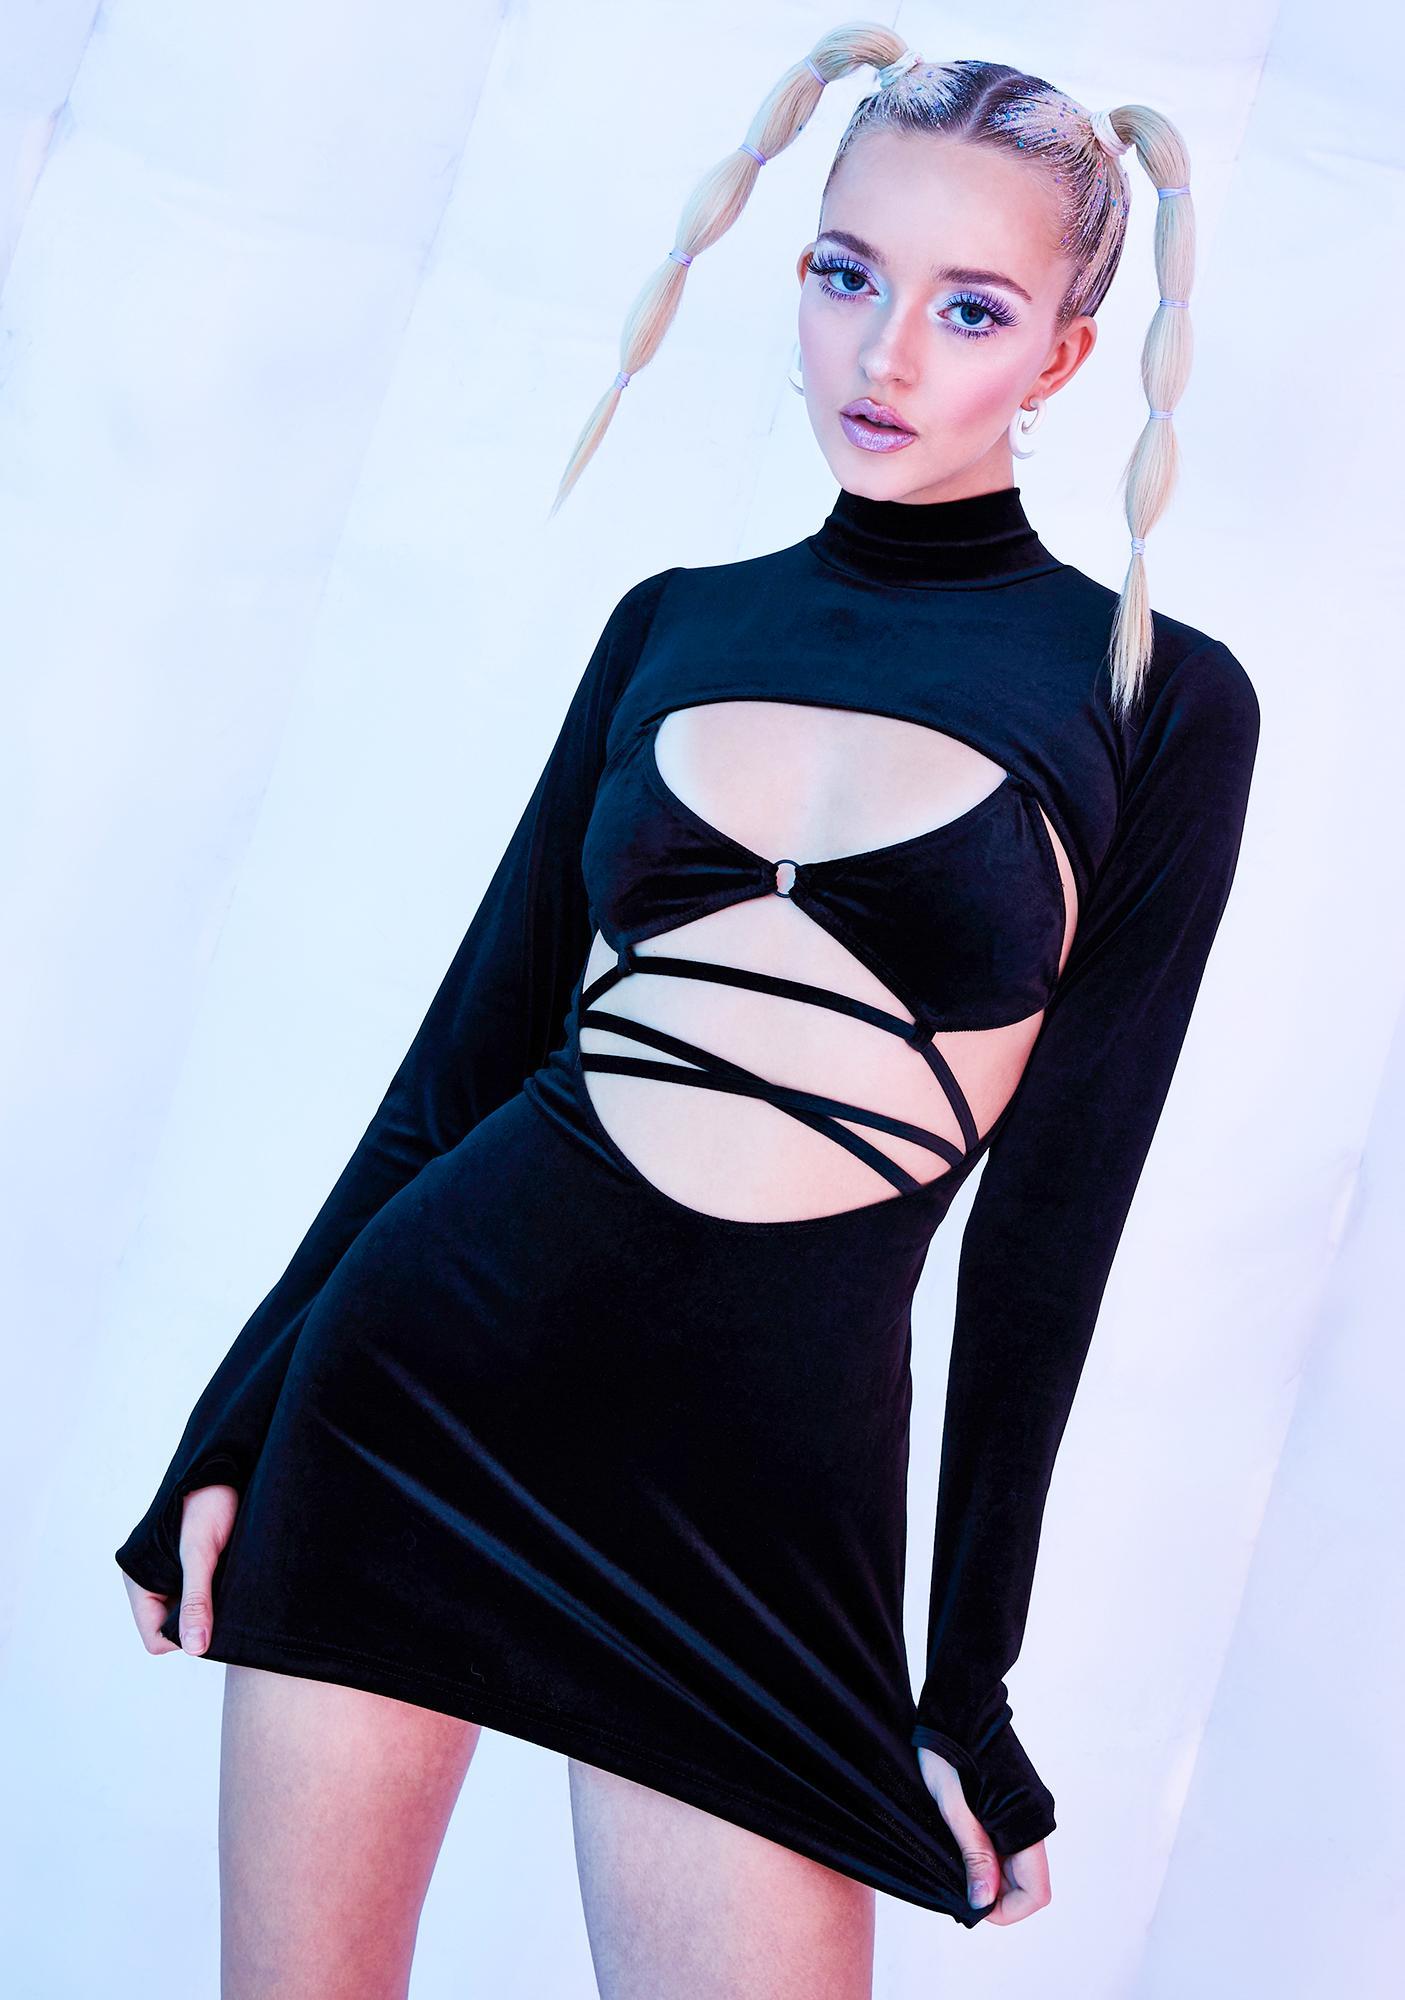 Club Exx Dark Rave Bunny Velvet Cut-Out Dress